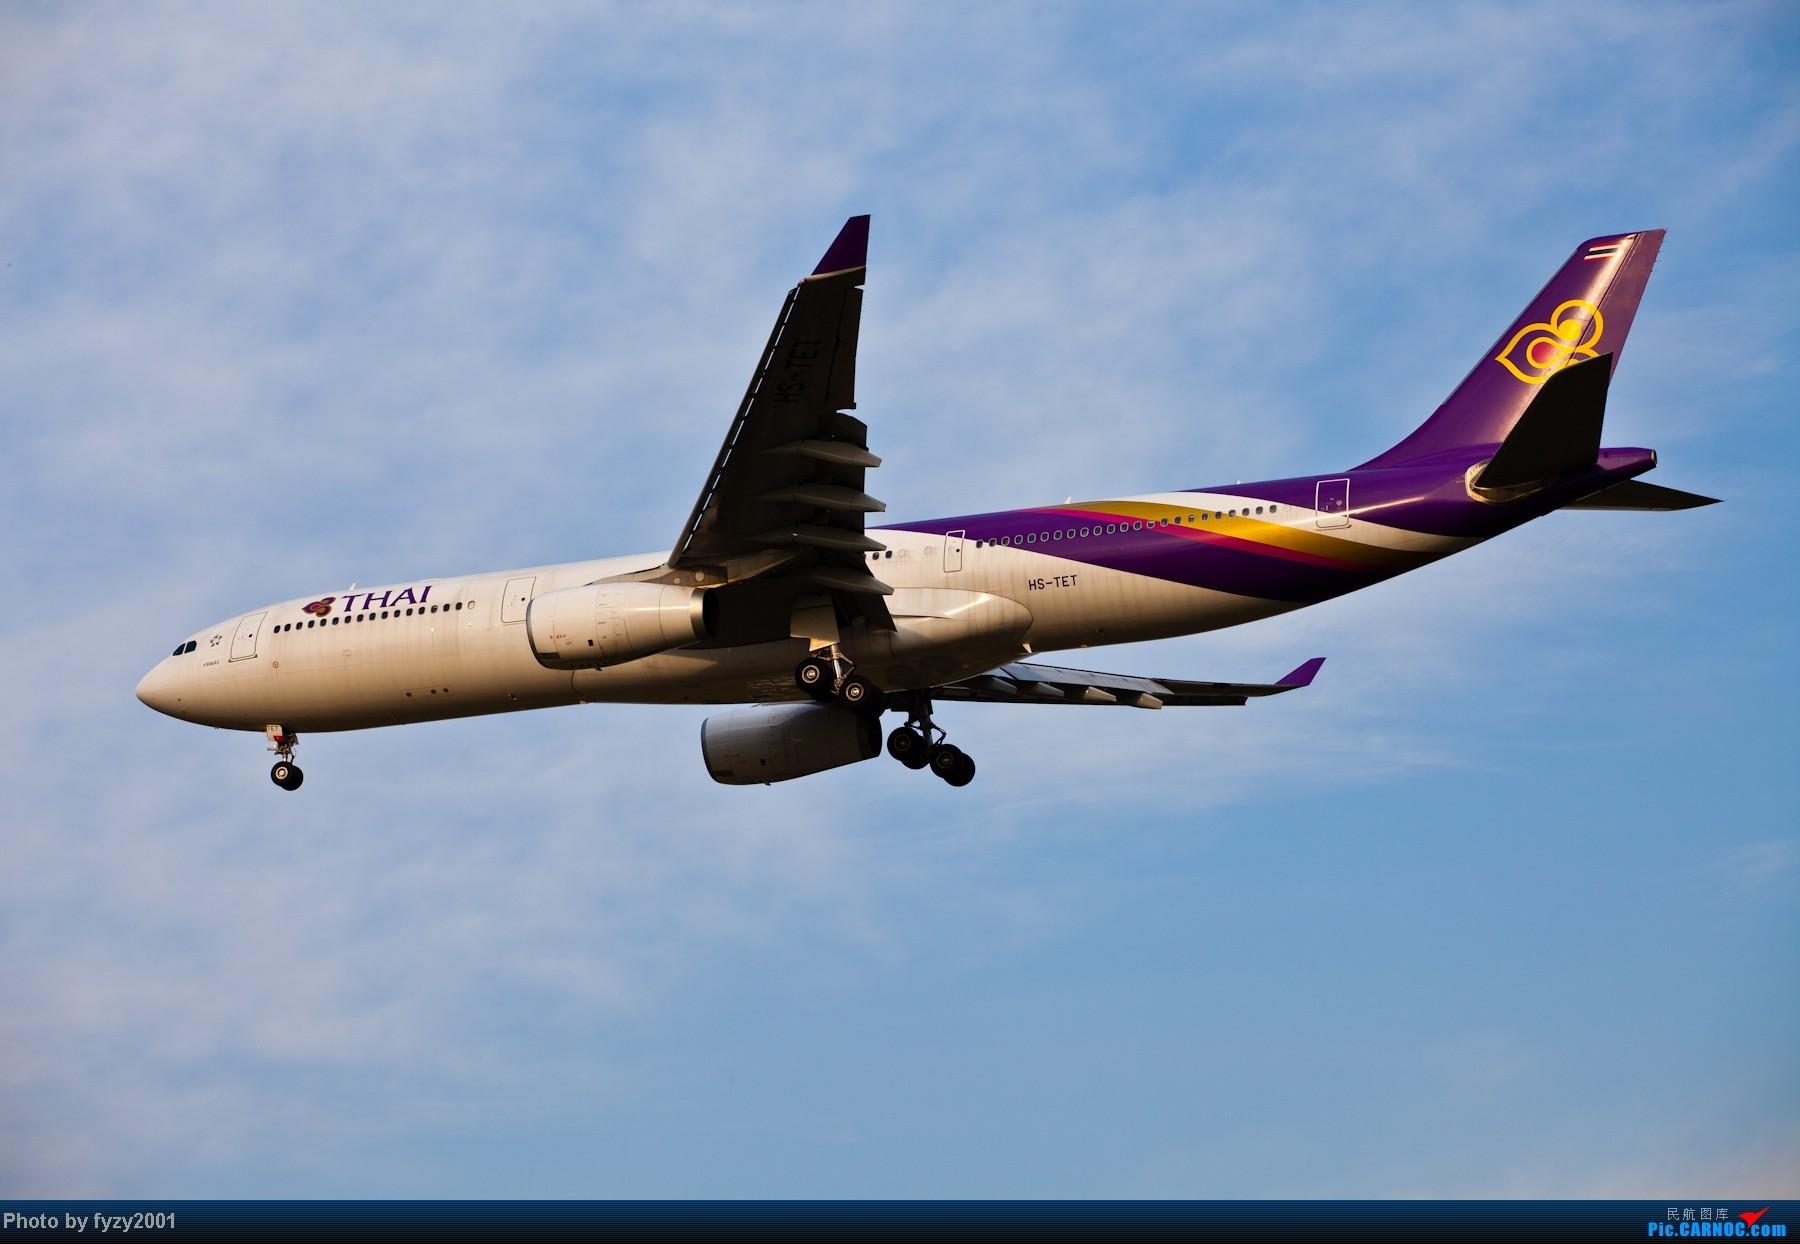 Re:[原创][无锡西站]长假PVG蹲守~~~~只发大图,多图杀猫~~~~ AIRBUS A330-300 HS-TET 中国上海浦东机场